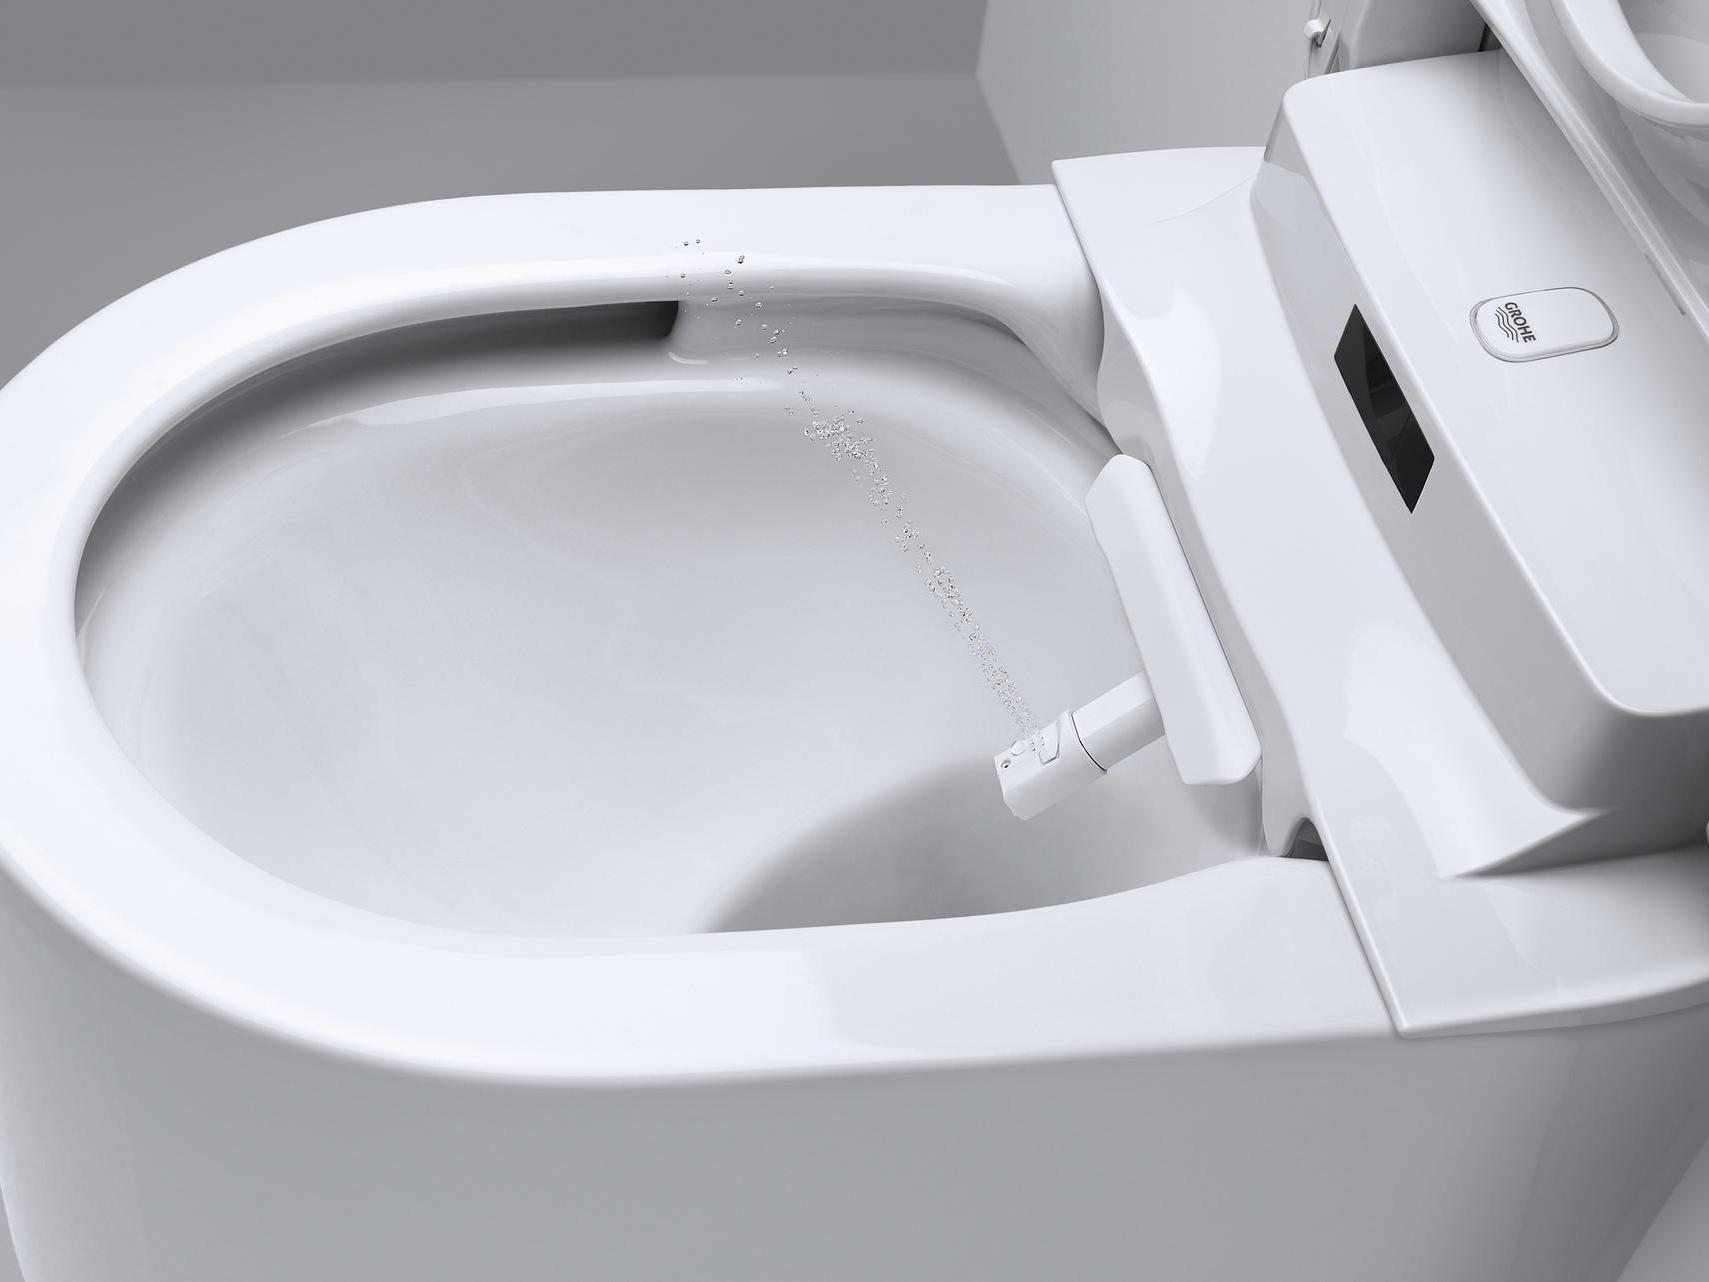 Full Size of Dusch Wc Geberit Mera Duravit Erfahrungen Testberichte Testsieger 2018 Oder Dusch Wc Sitz Nb09d Montageanleitung Englisch Dusche Ebenerdig Begehbare Duschen Dusche Dusch Wc